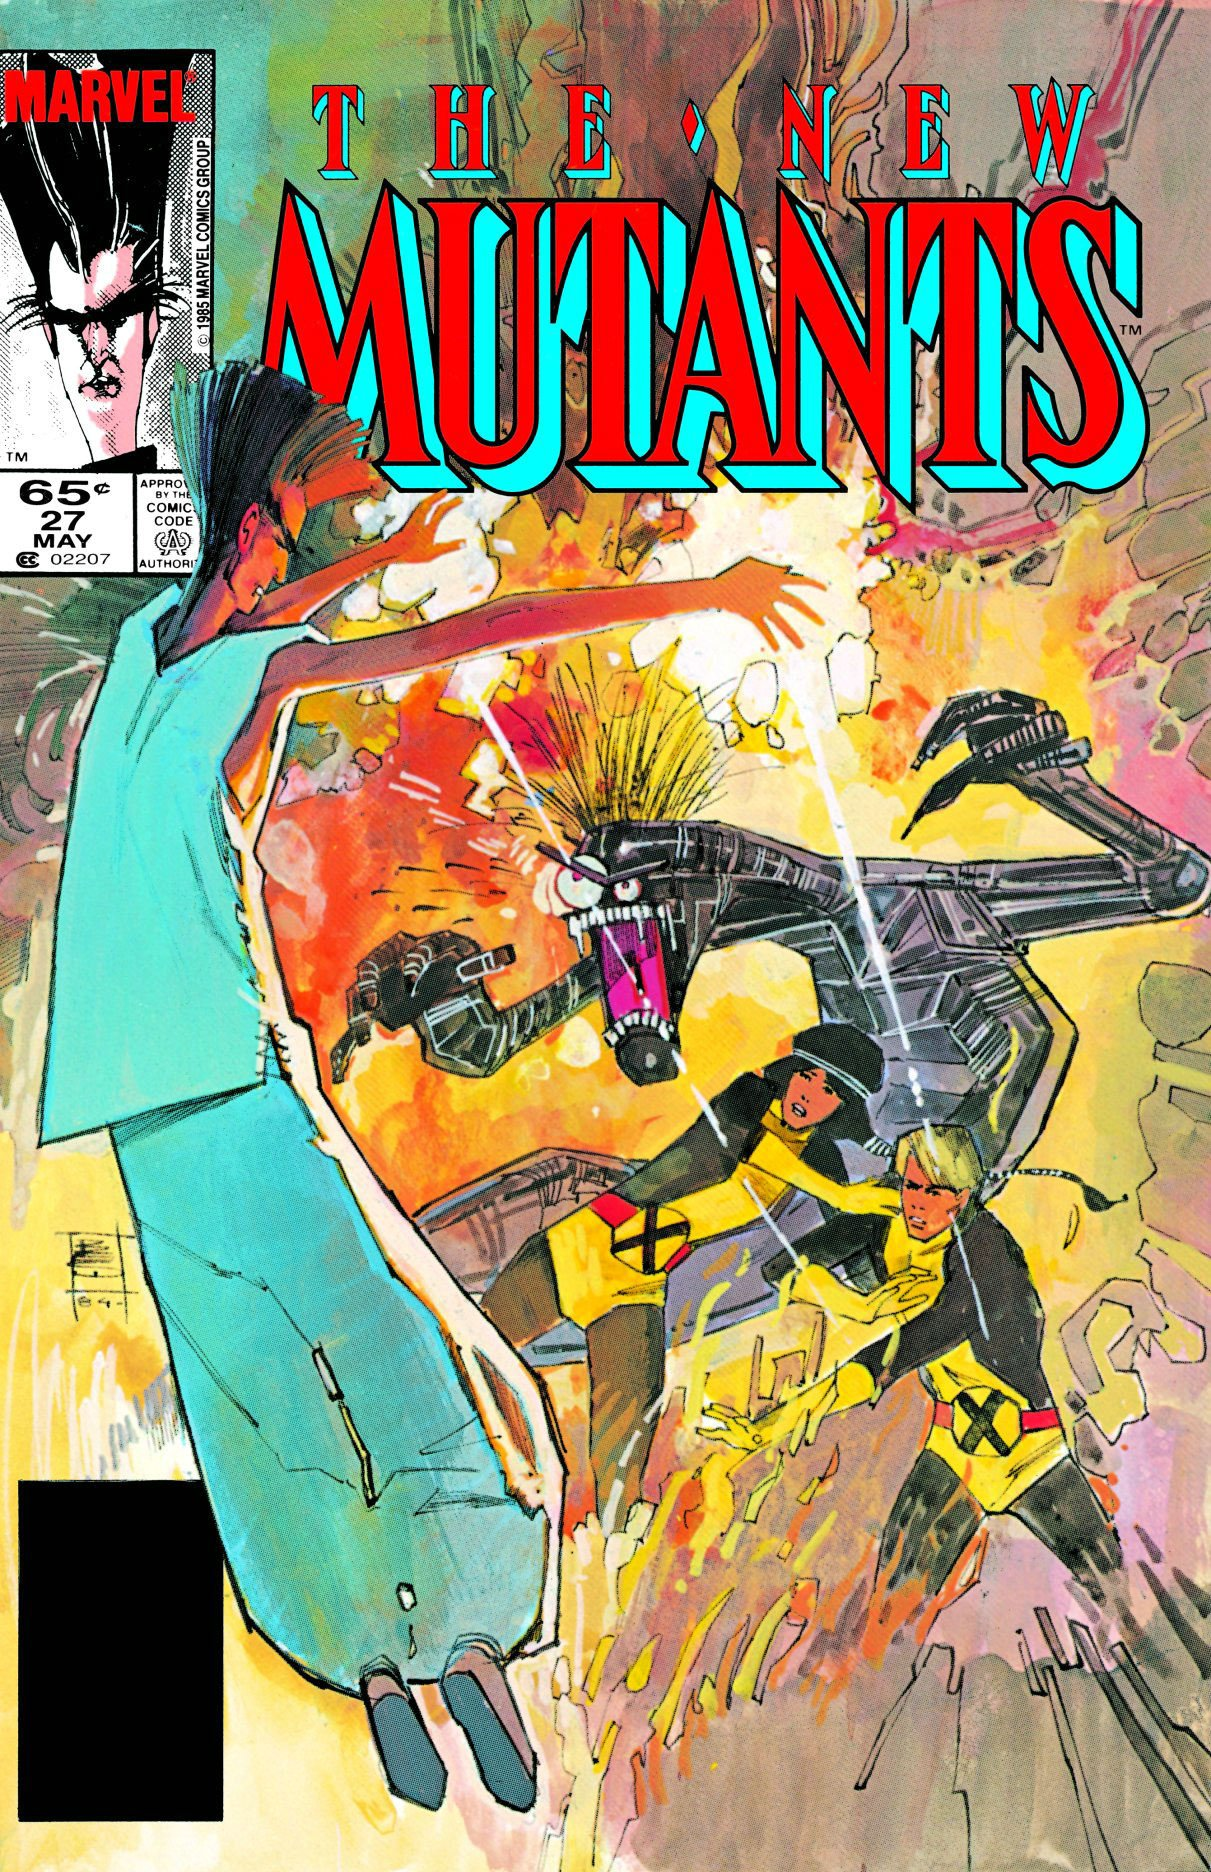 New Mutants 1983 series # 65 very fine comic book